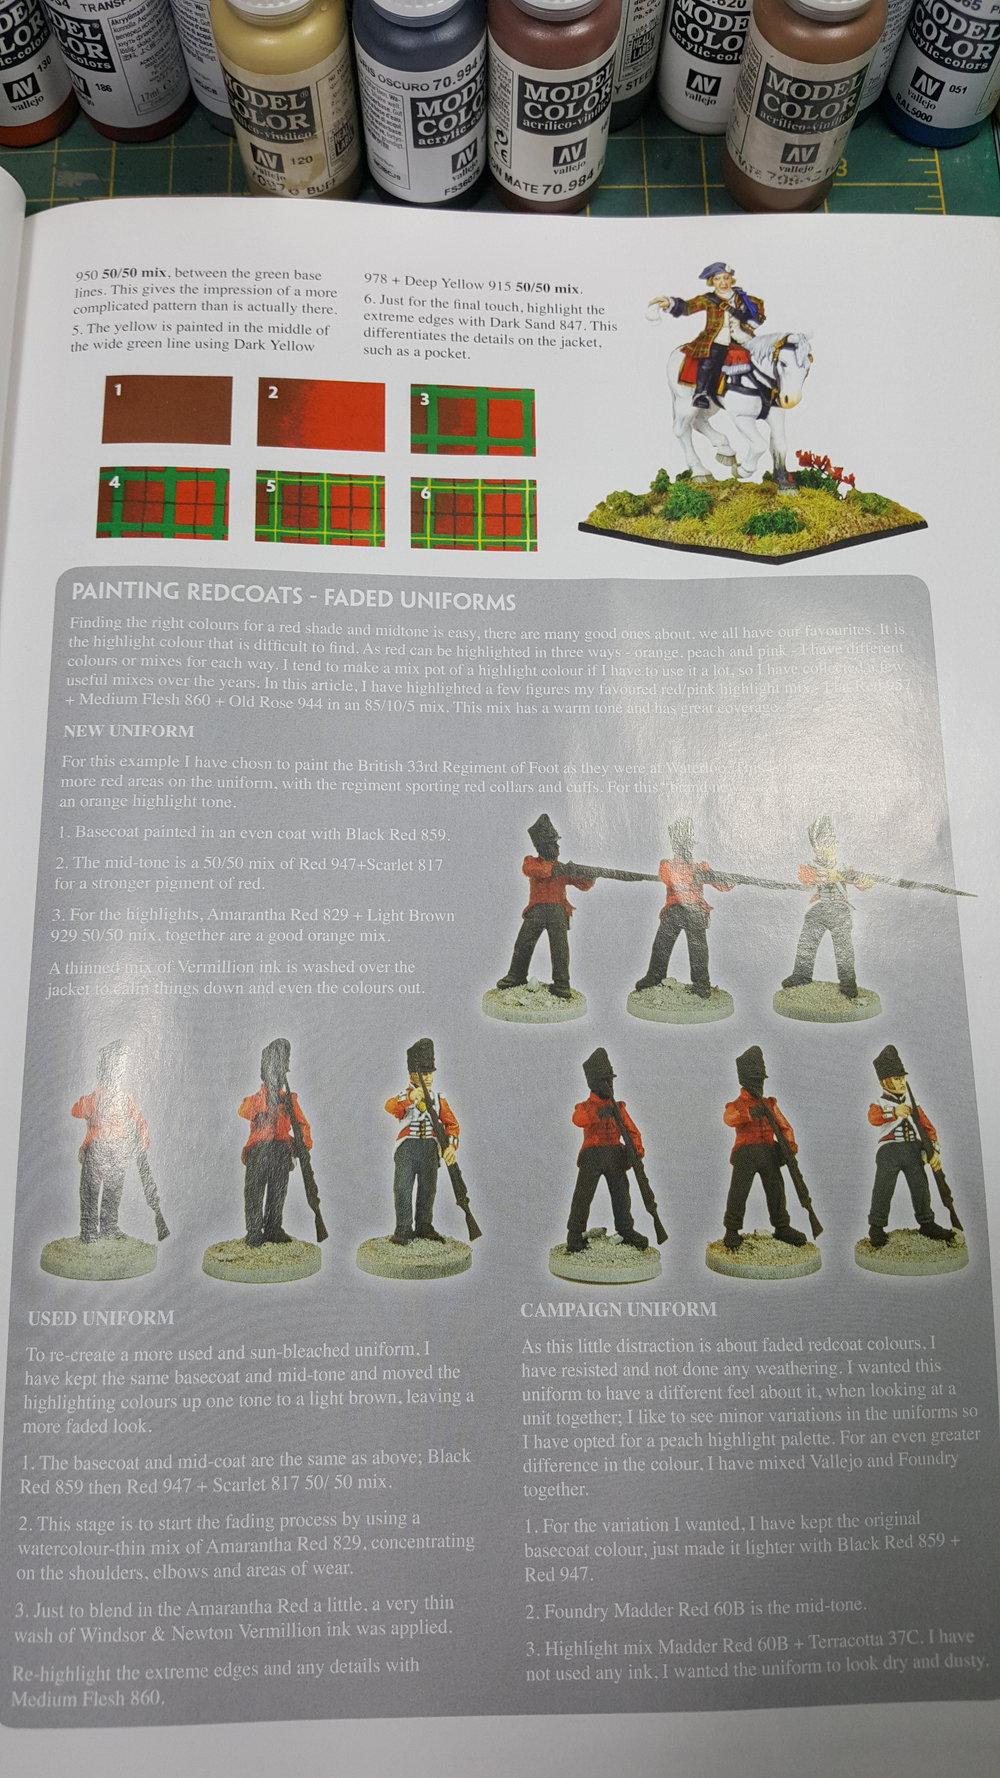 WargamesInterior02.jpg